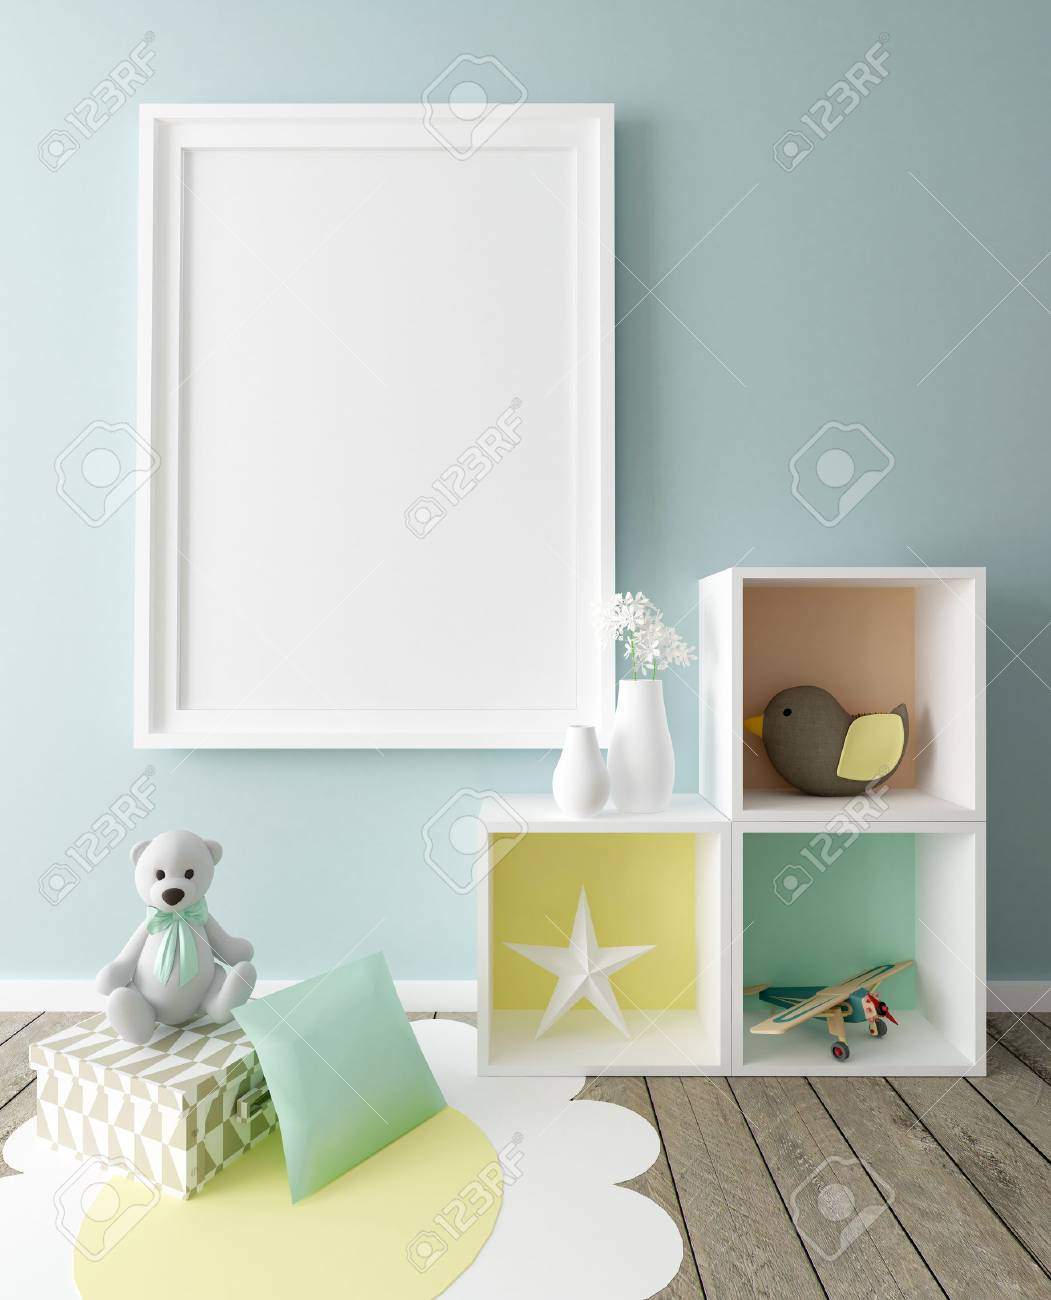 Poster Frame Mockup in Children Room Interior - 77592520